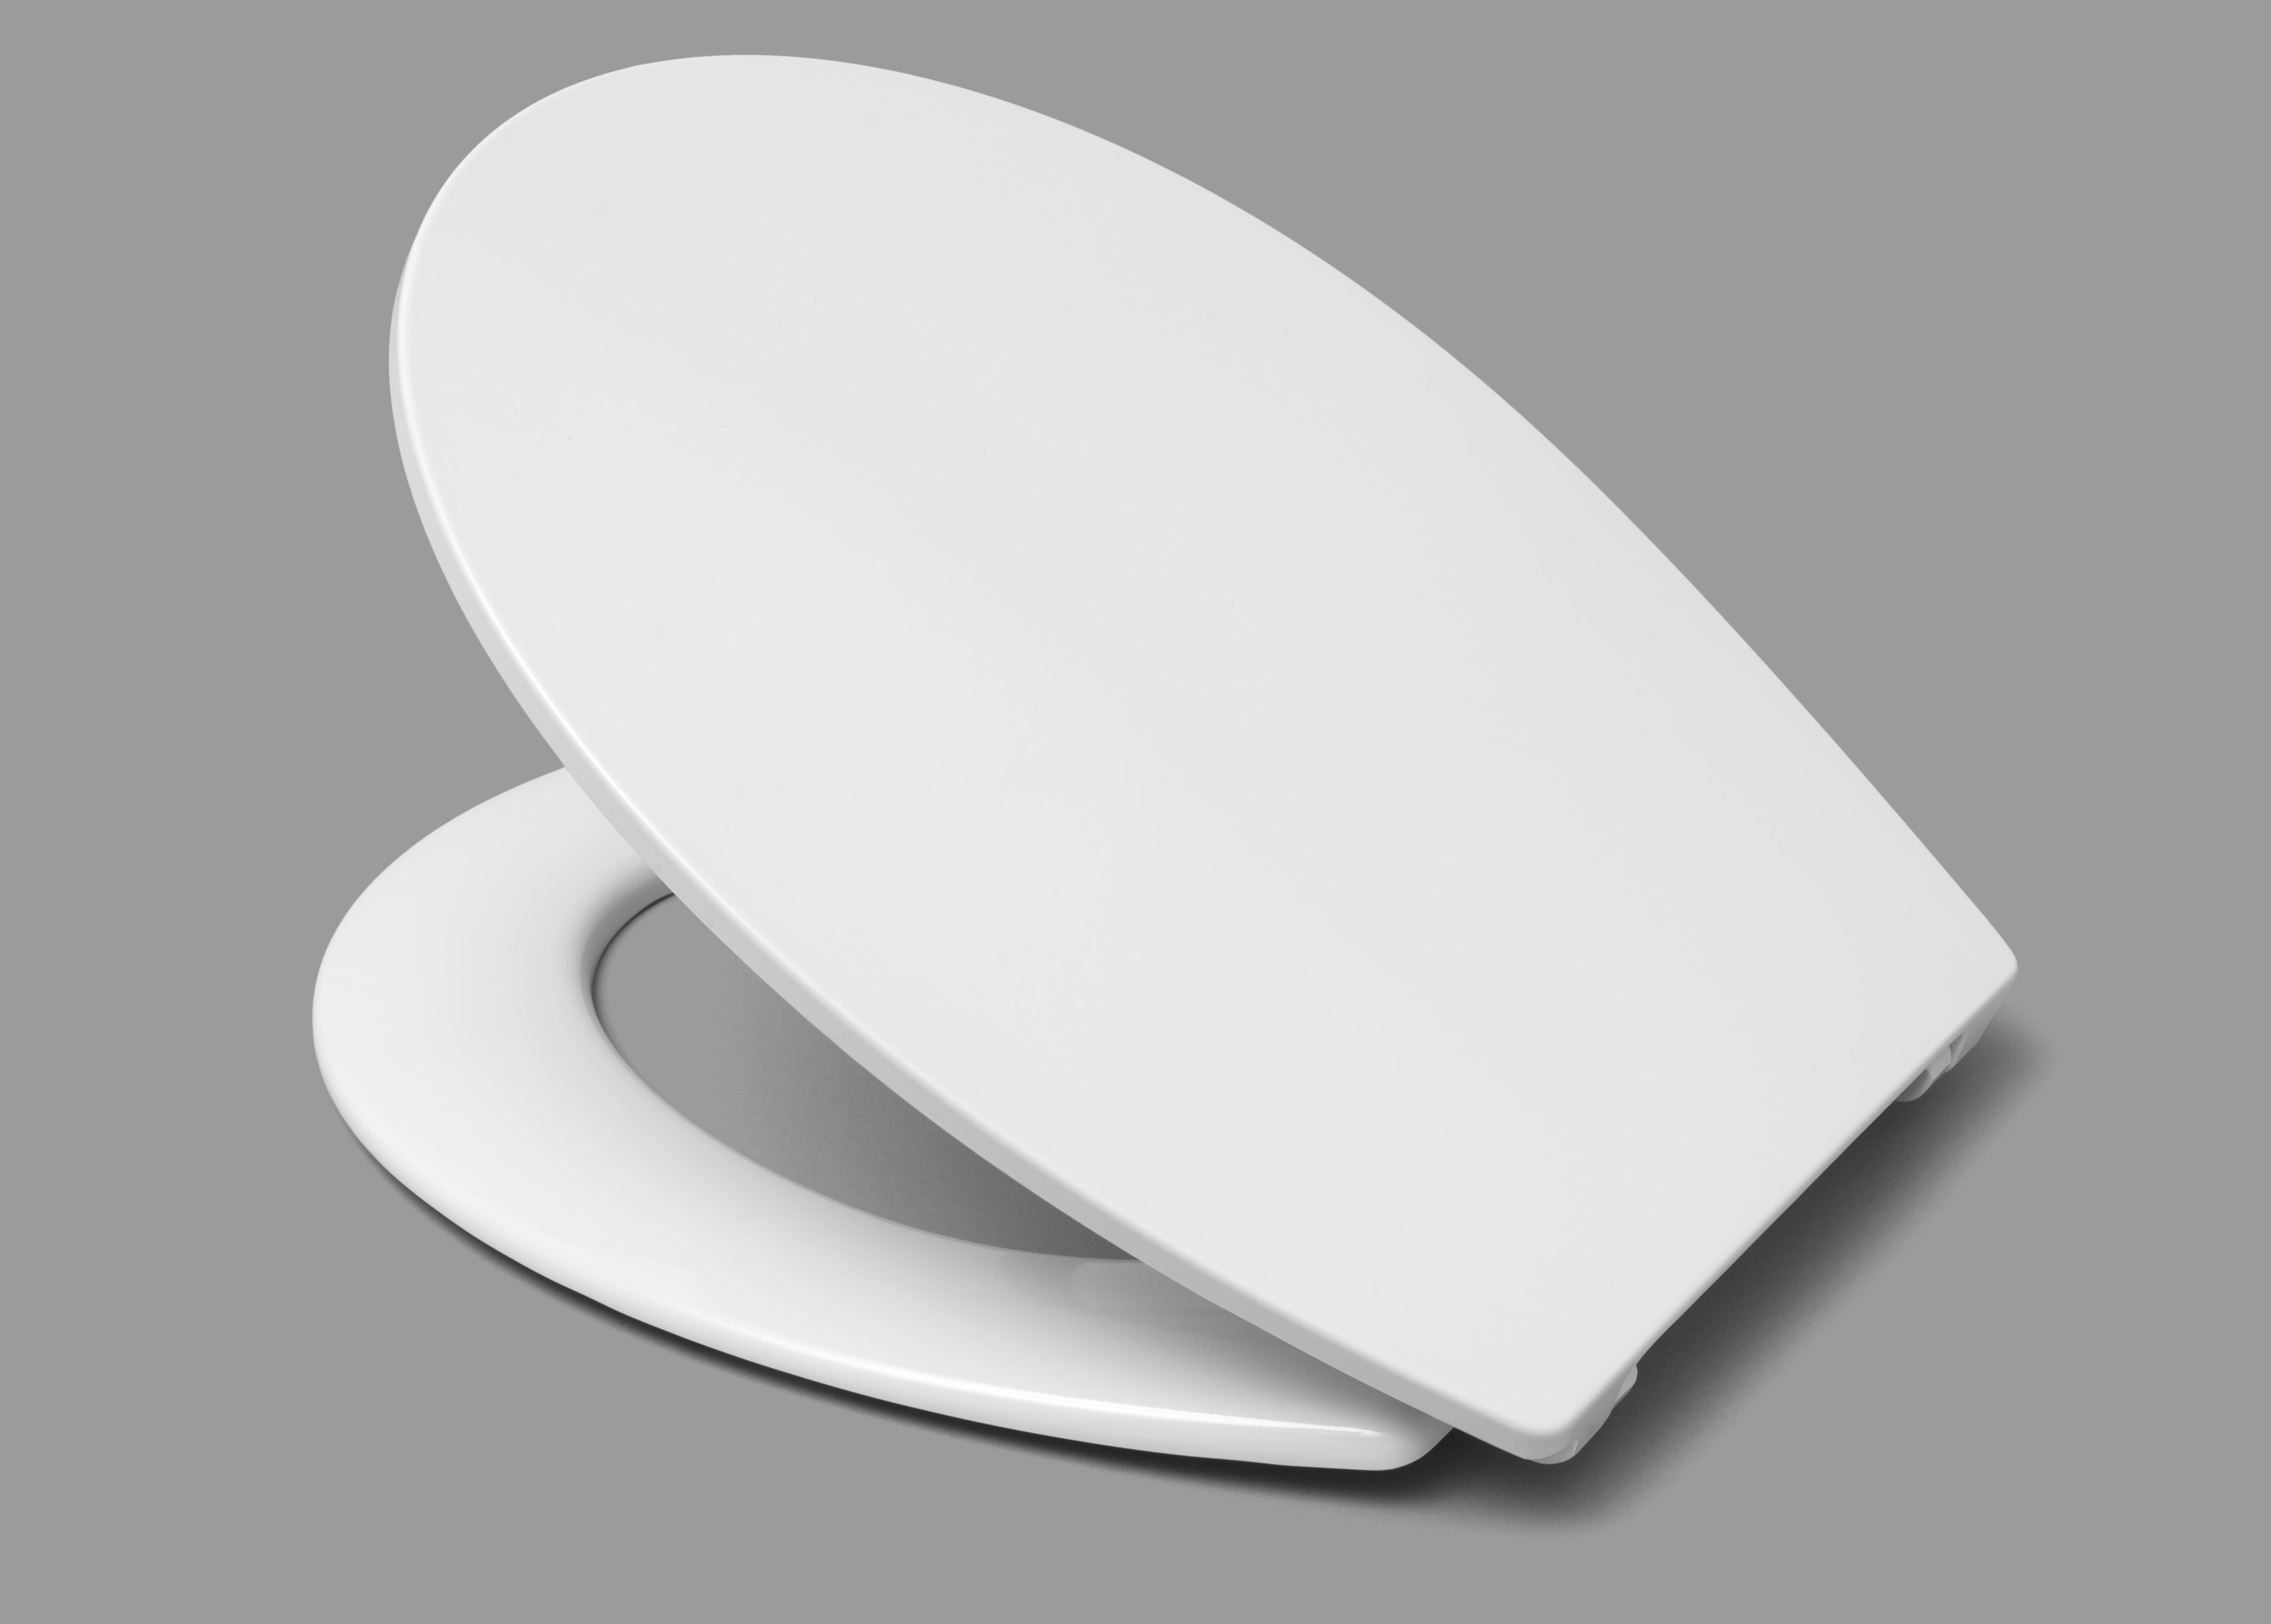 Capac WC HARO Duroplast REVO alb, sistem prindere inox FastFix